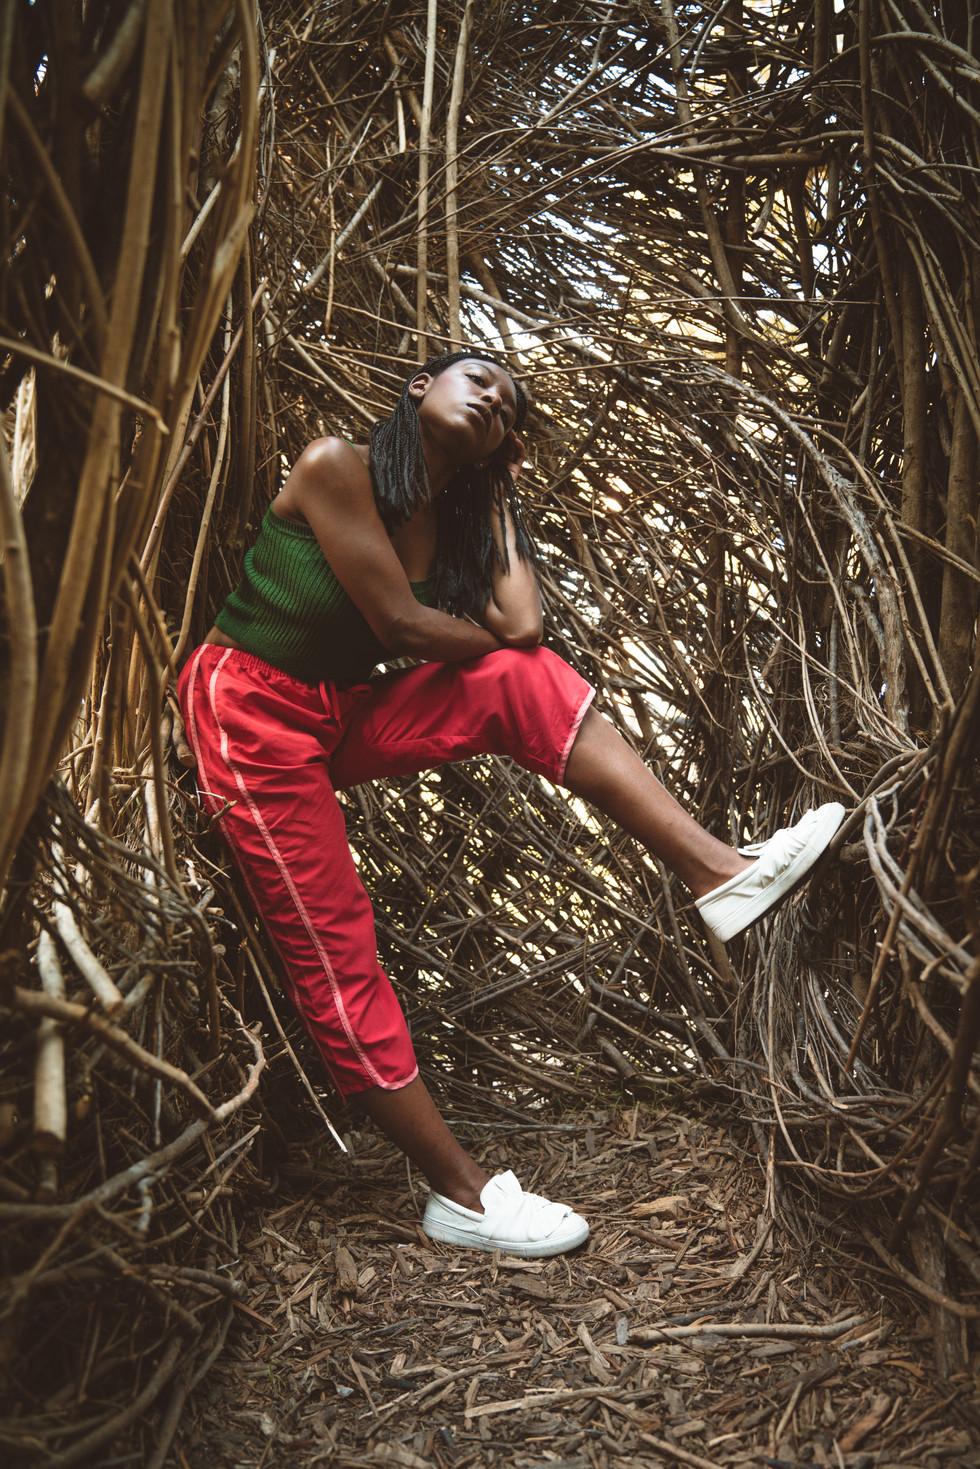 Model in Tree Sculpture | Portrait/Fashion Photography | Chromatone Studios